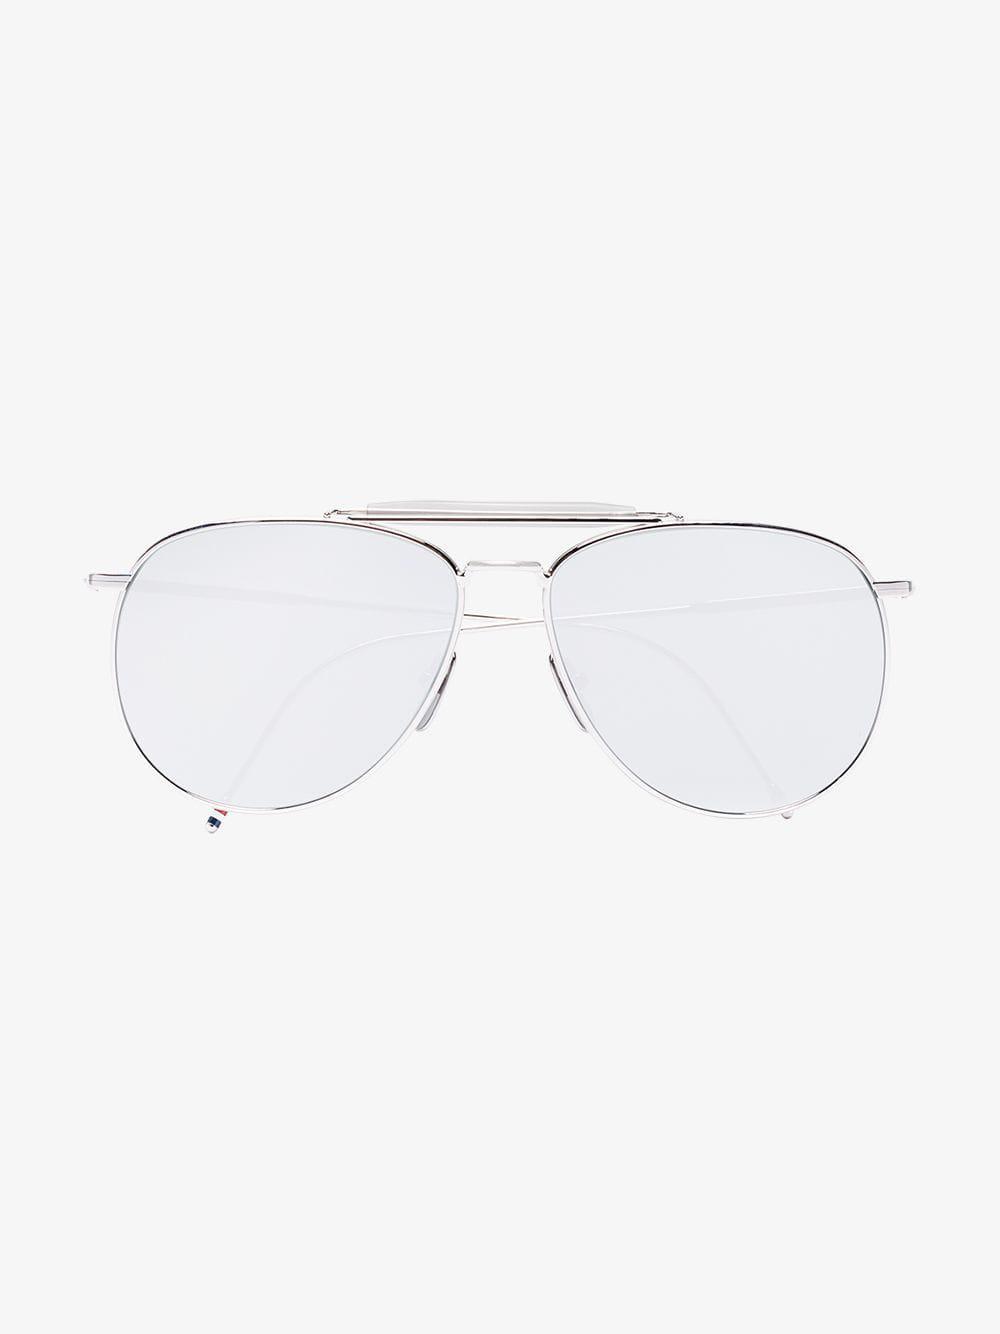 618a30533ed Lyst - Thom Browne Metallic Silver Aviator Mirror Sunglasses in ...